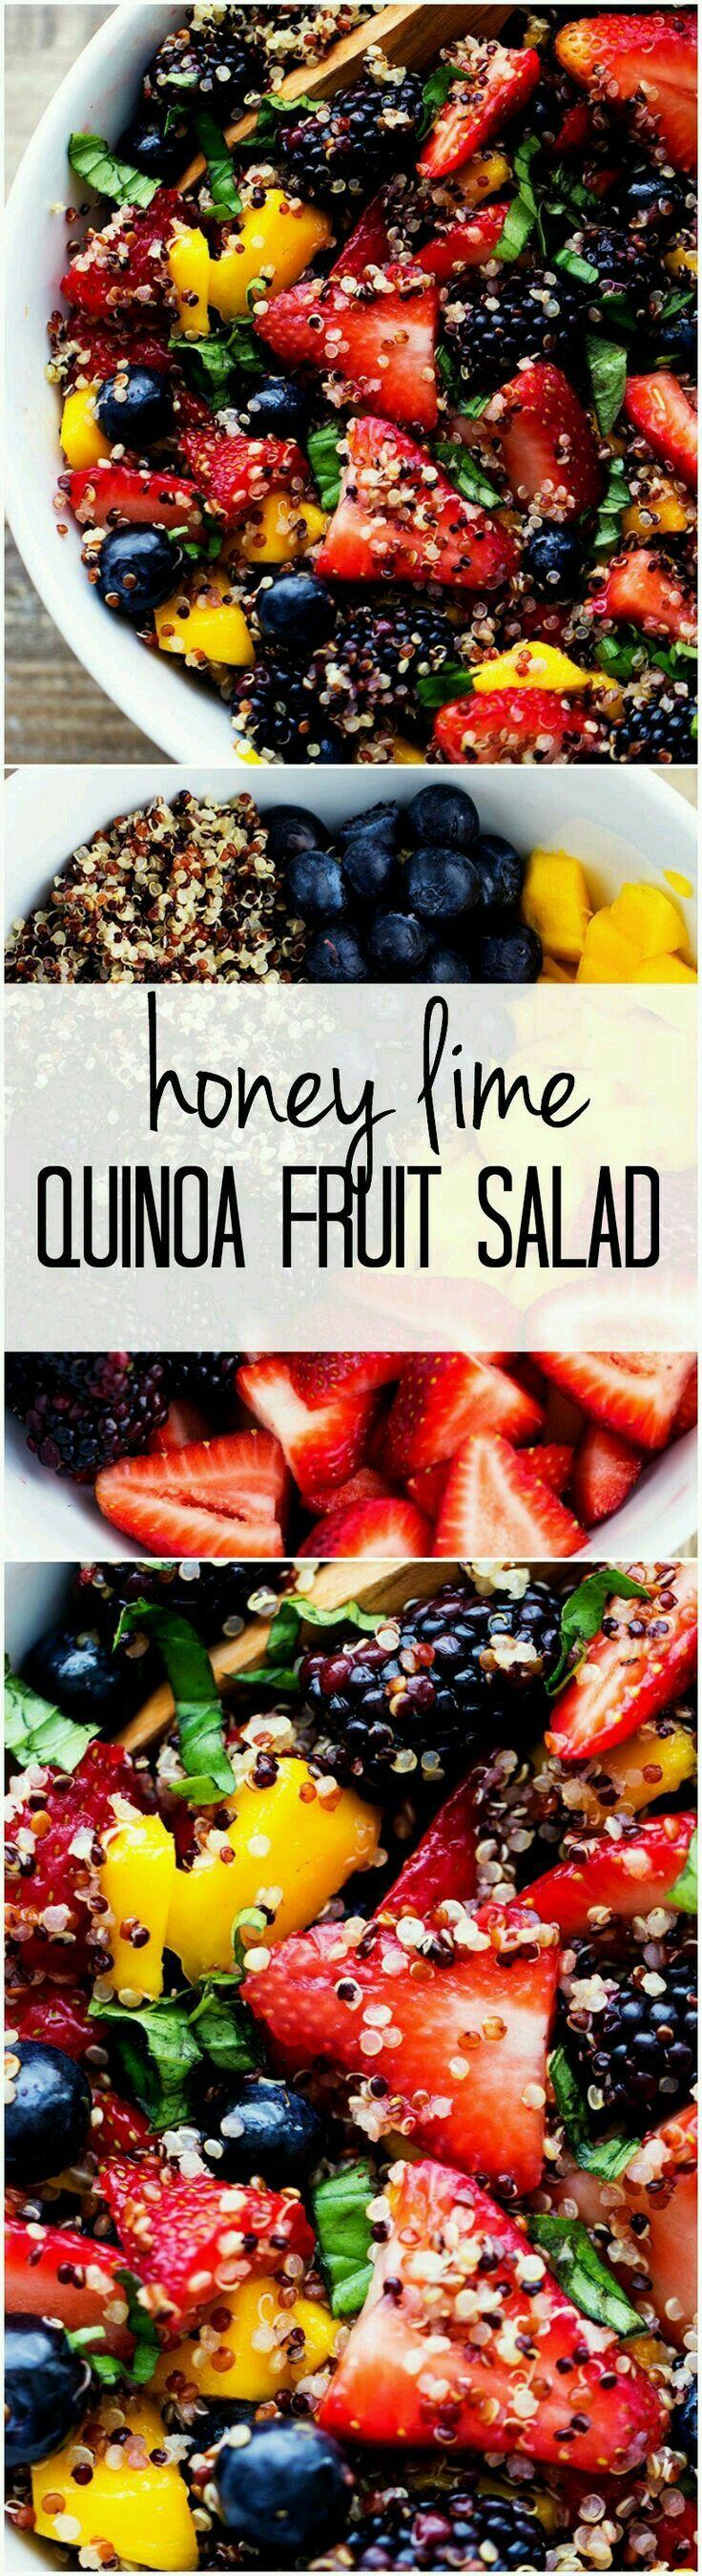 Light, Refreshing, Honey Lime Quinoa Fruit Salad - Produce 1-1/2 C. Basil 1 C. Blackberries 1 C. Blueberries 1 Mango 1-1/2 C. Strawberries Condiments 1/4 C. Honey 2 Tbsp. Lime Juice Pasta & Grains 1 C. Quinoa (tri-colored) therecipecritic.com